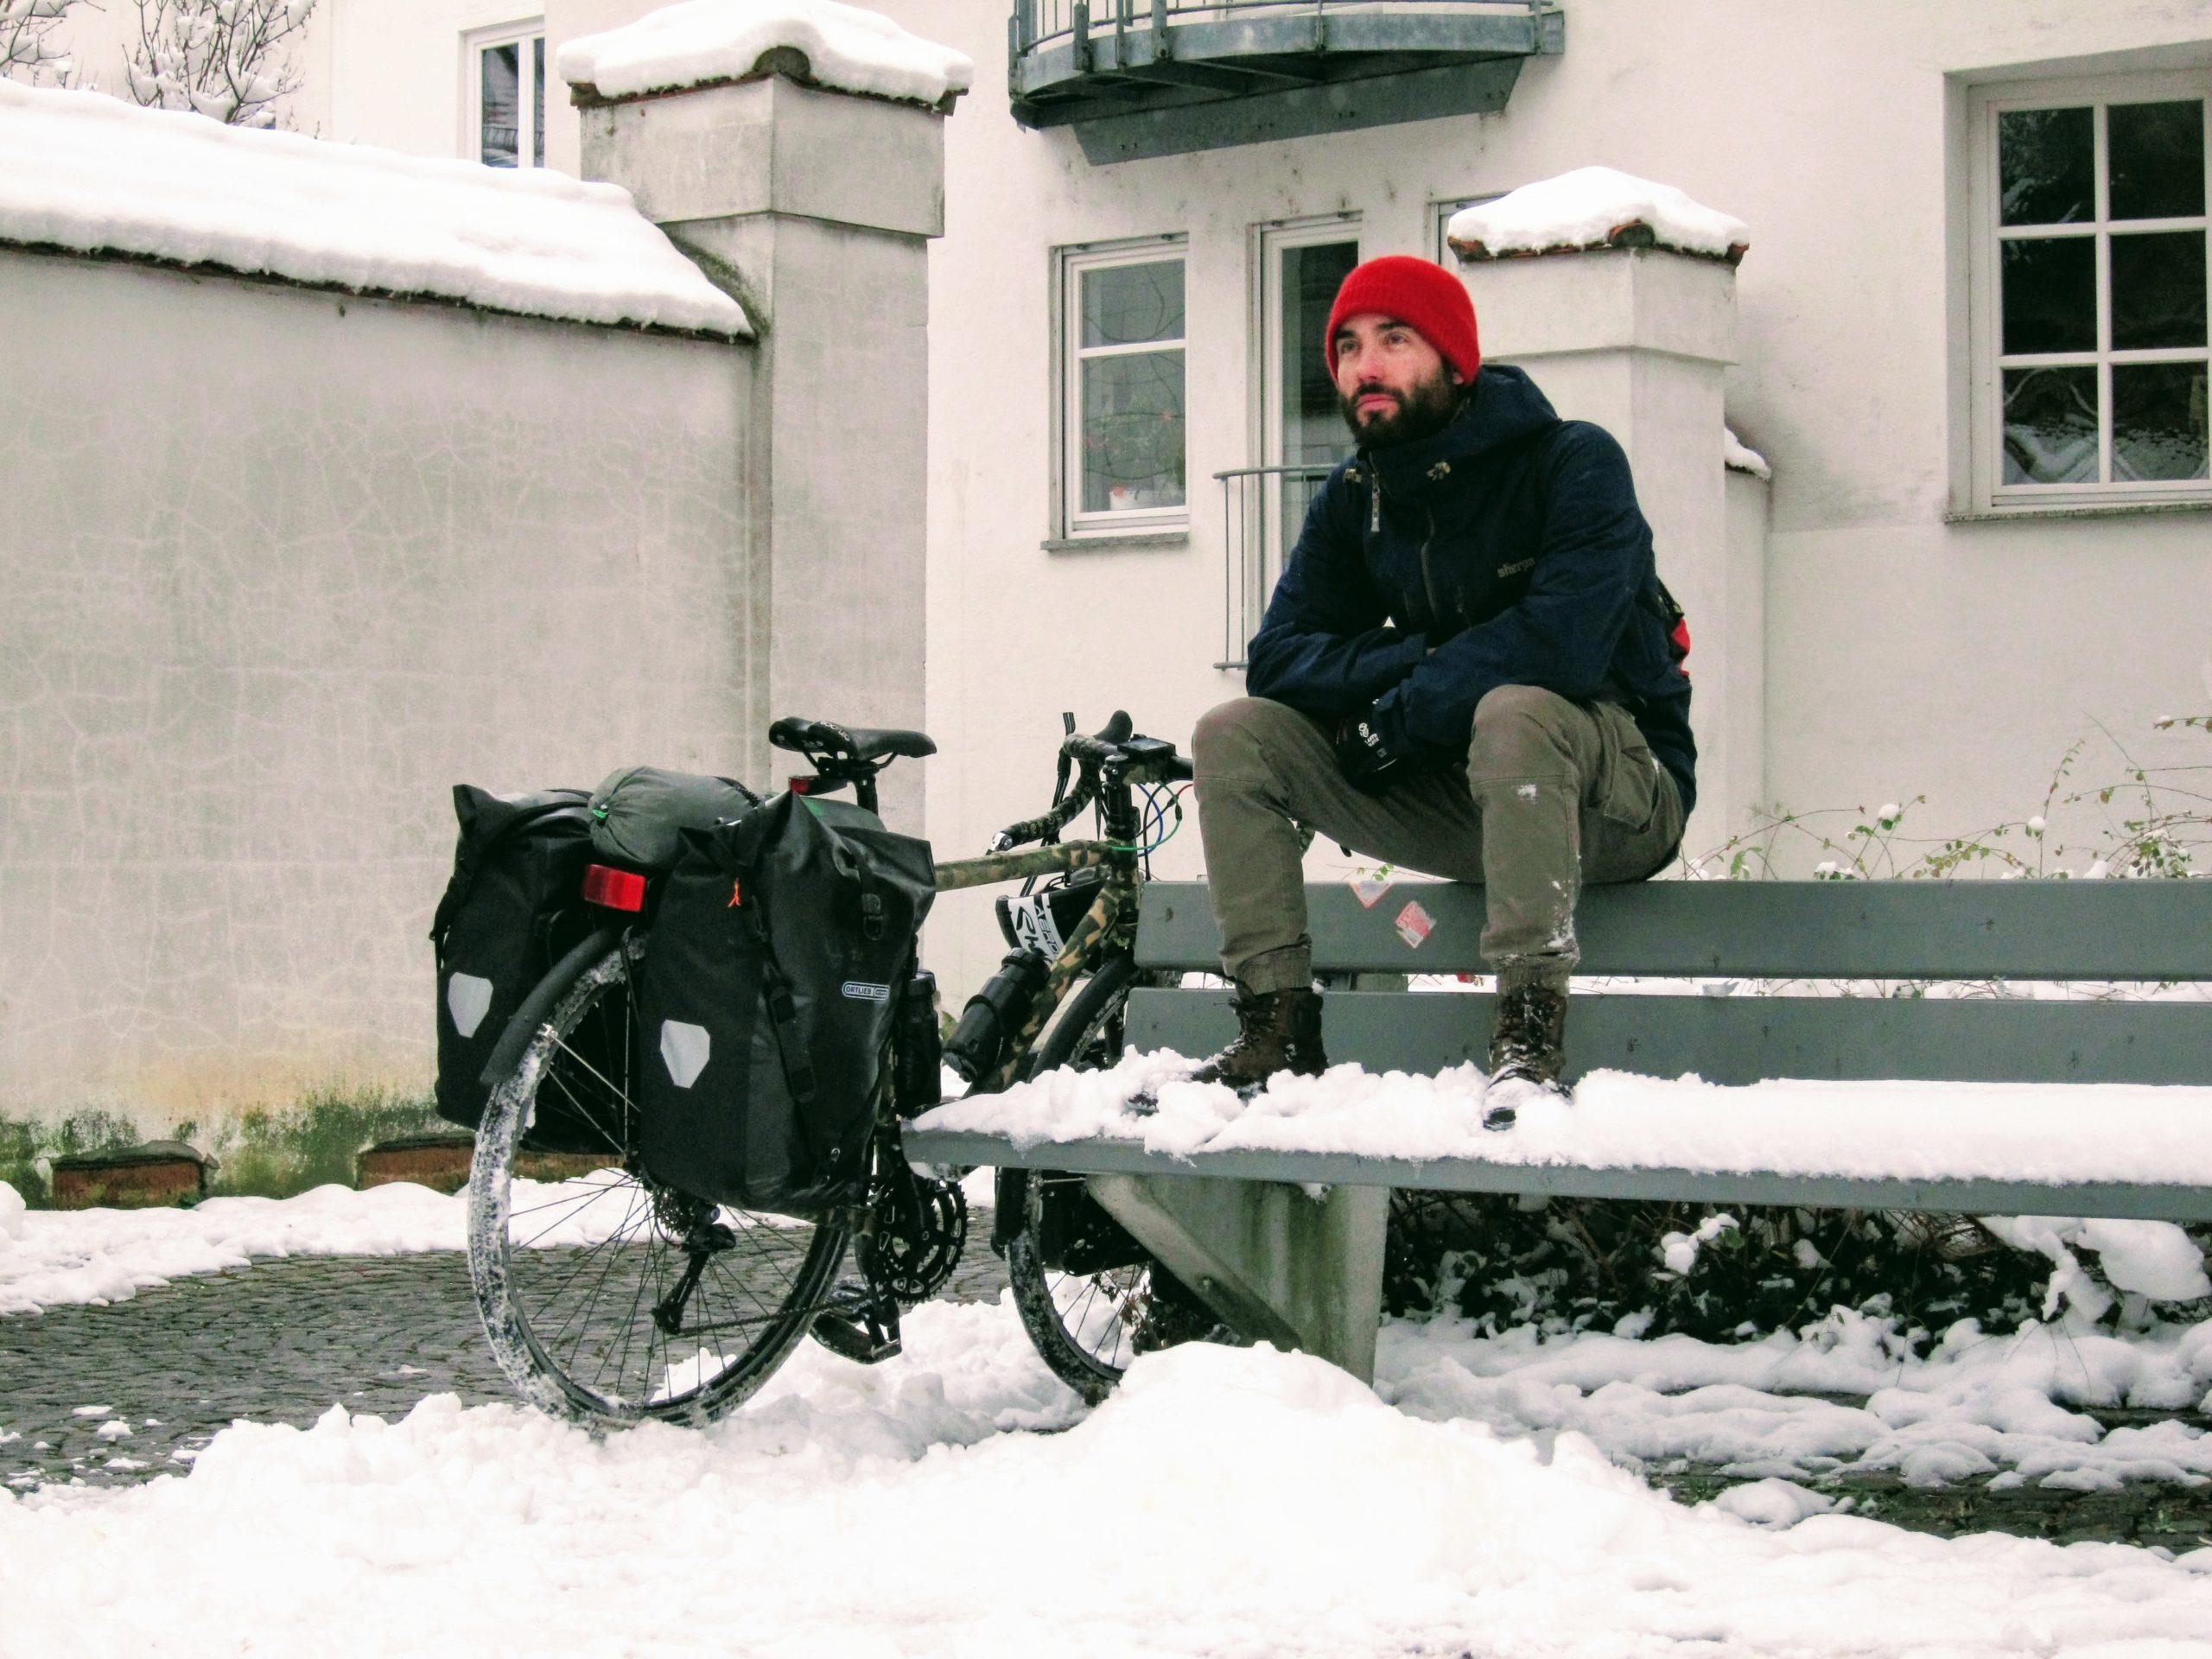 bavière cyclotouriste